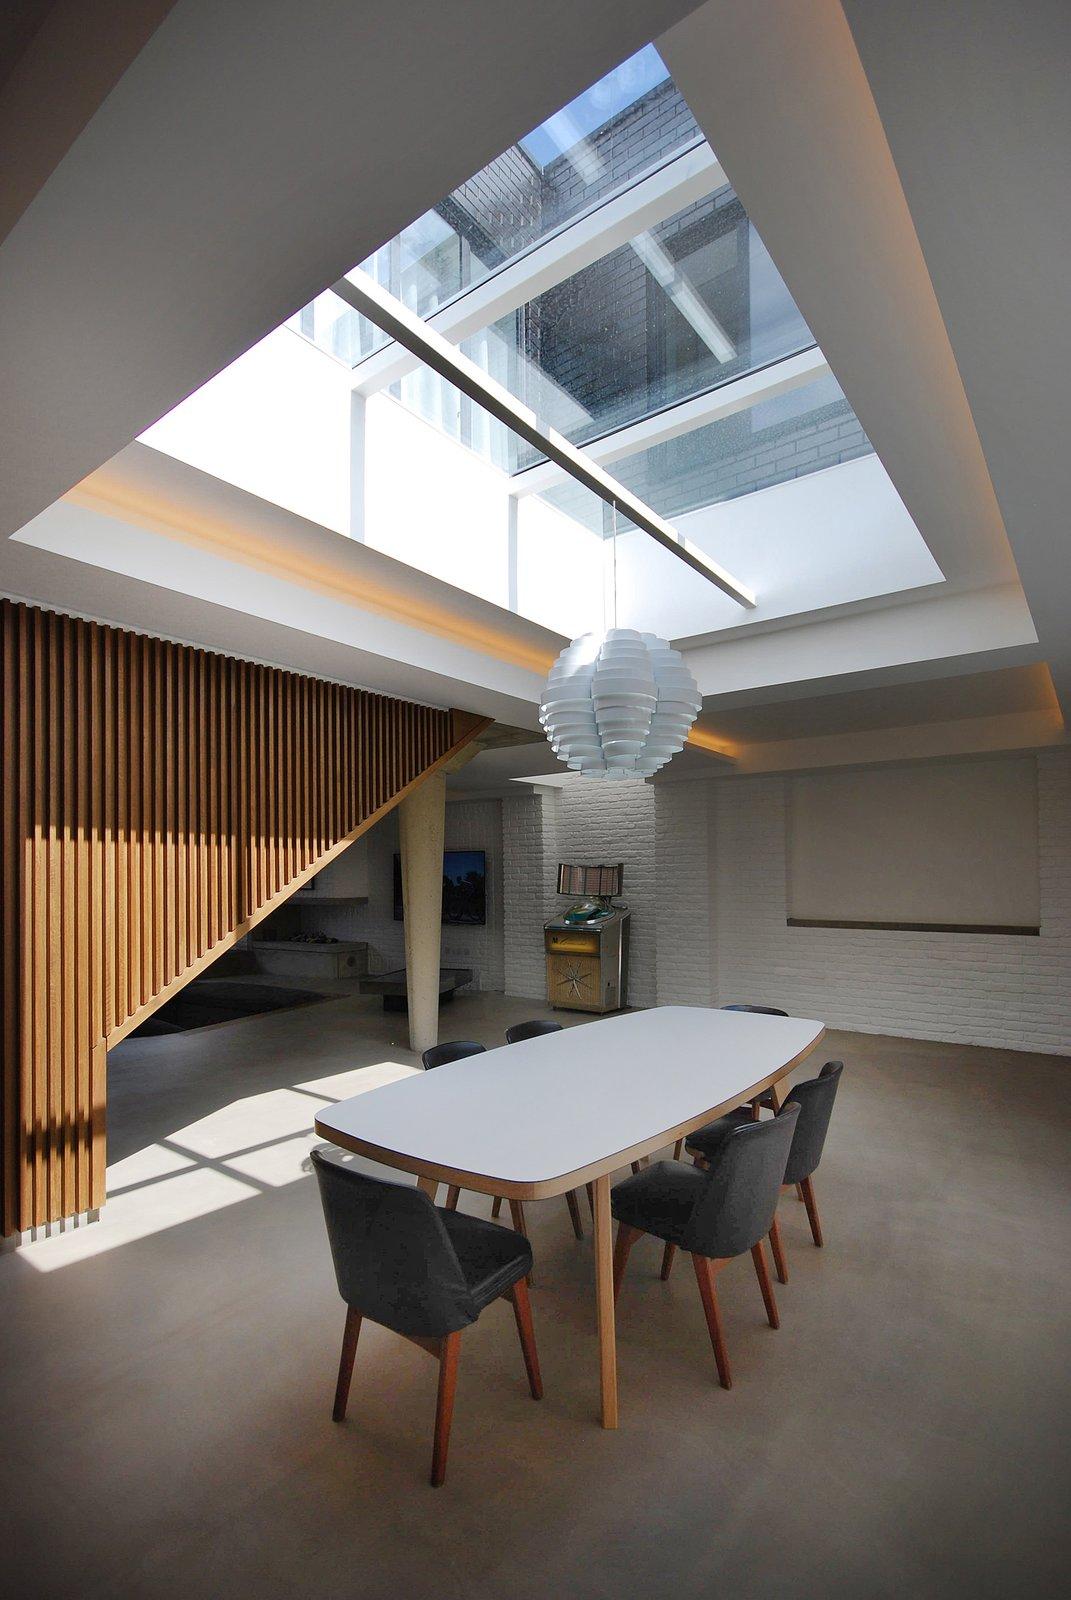 #interior #dining #modern #table #diningarea #naturallighting #skylight #london #jamesburleigh #brick #industrial #woodwall